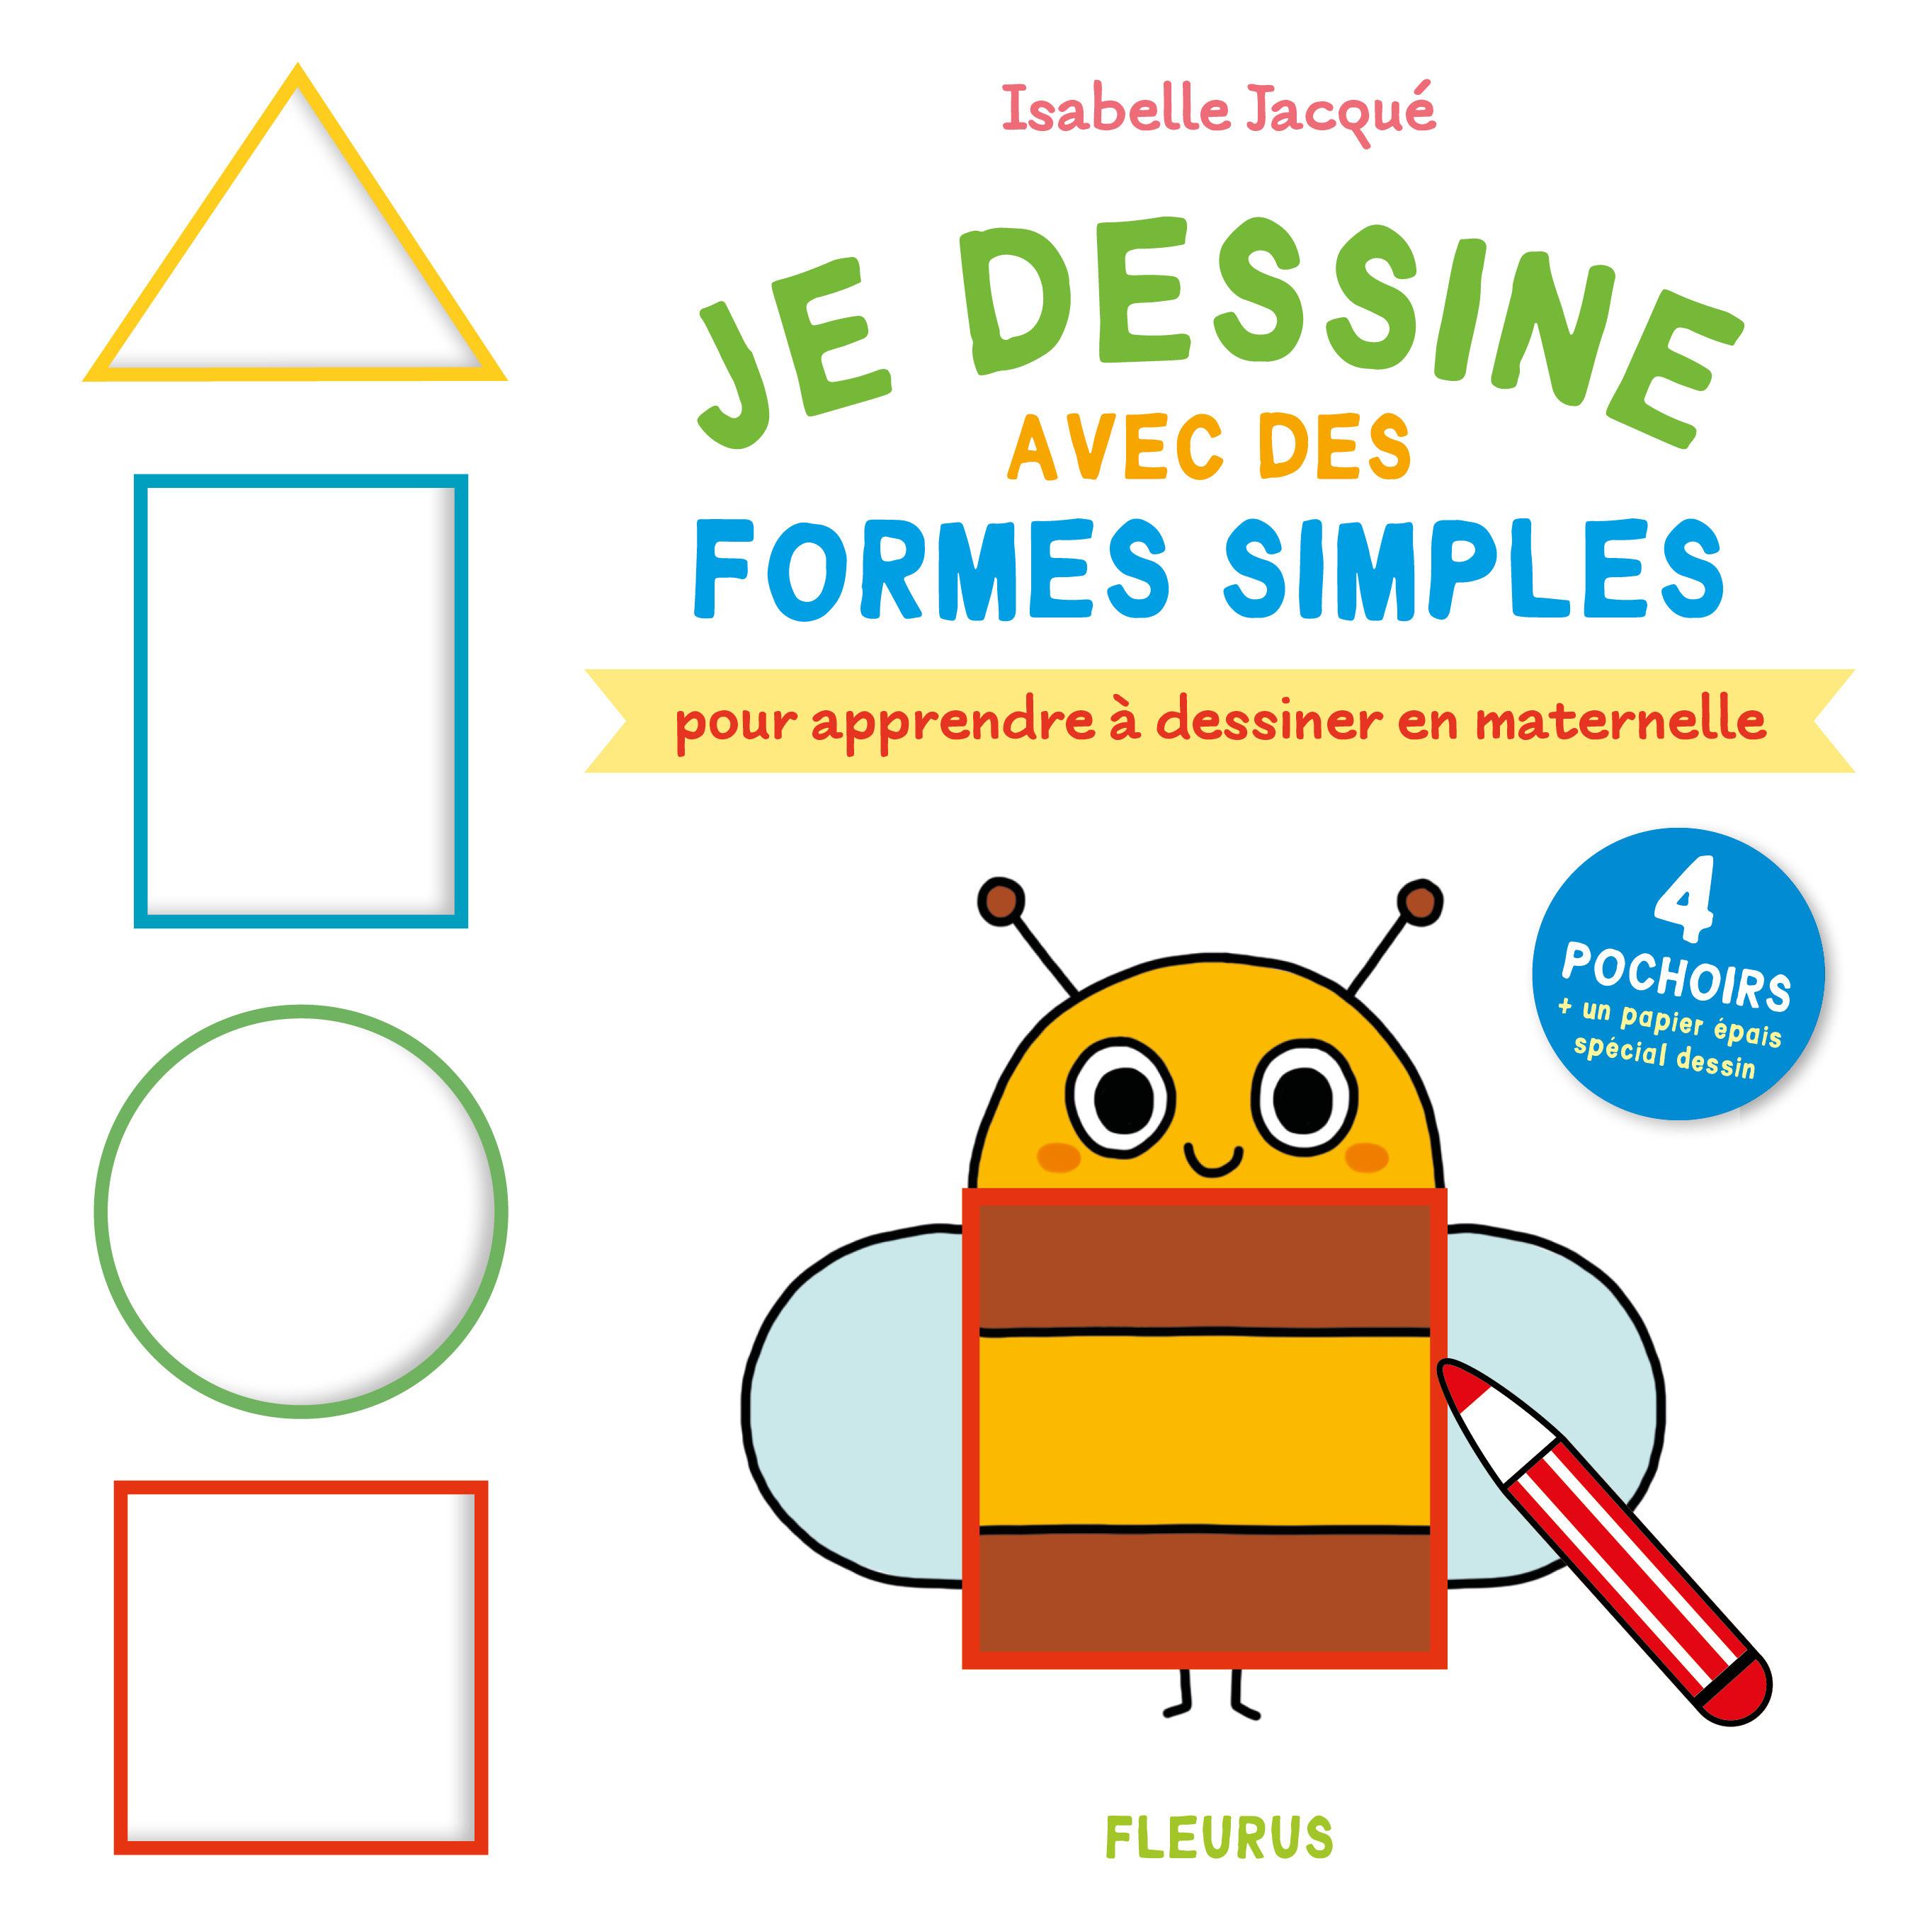 JE DESSINE AVEC DES FORMES SIMPLES